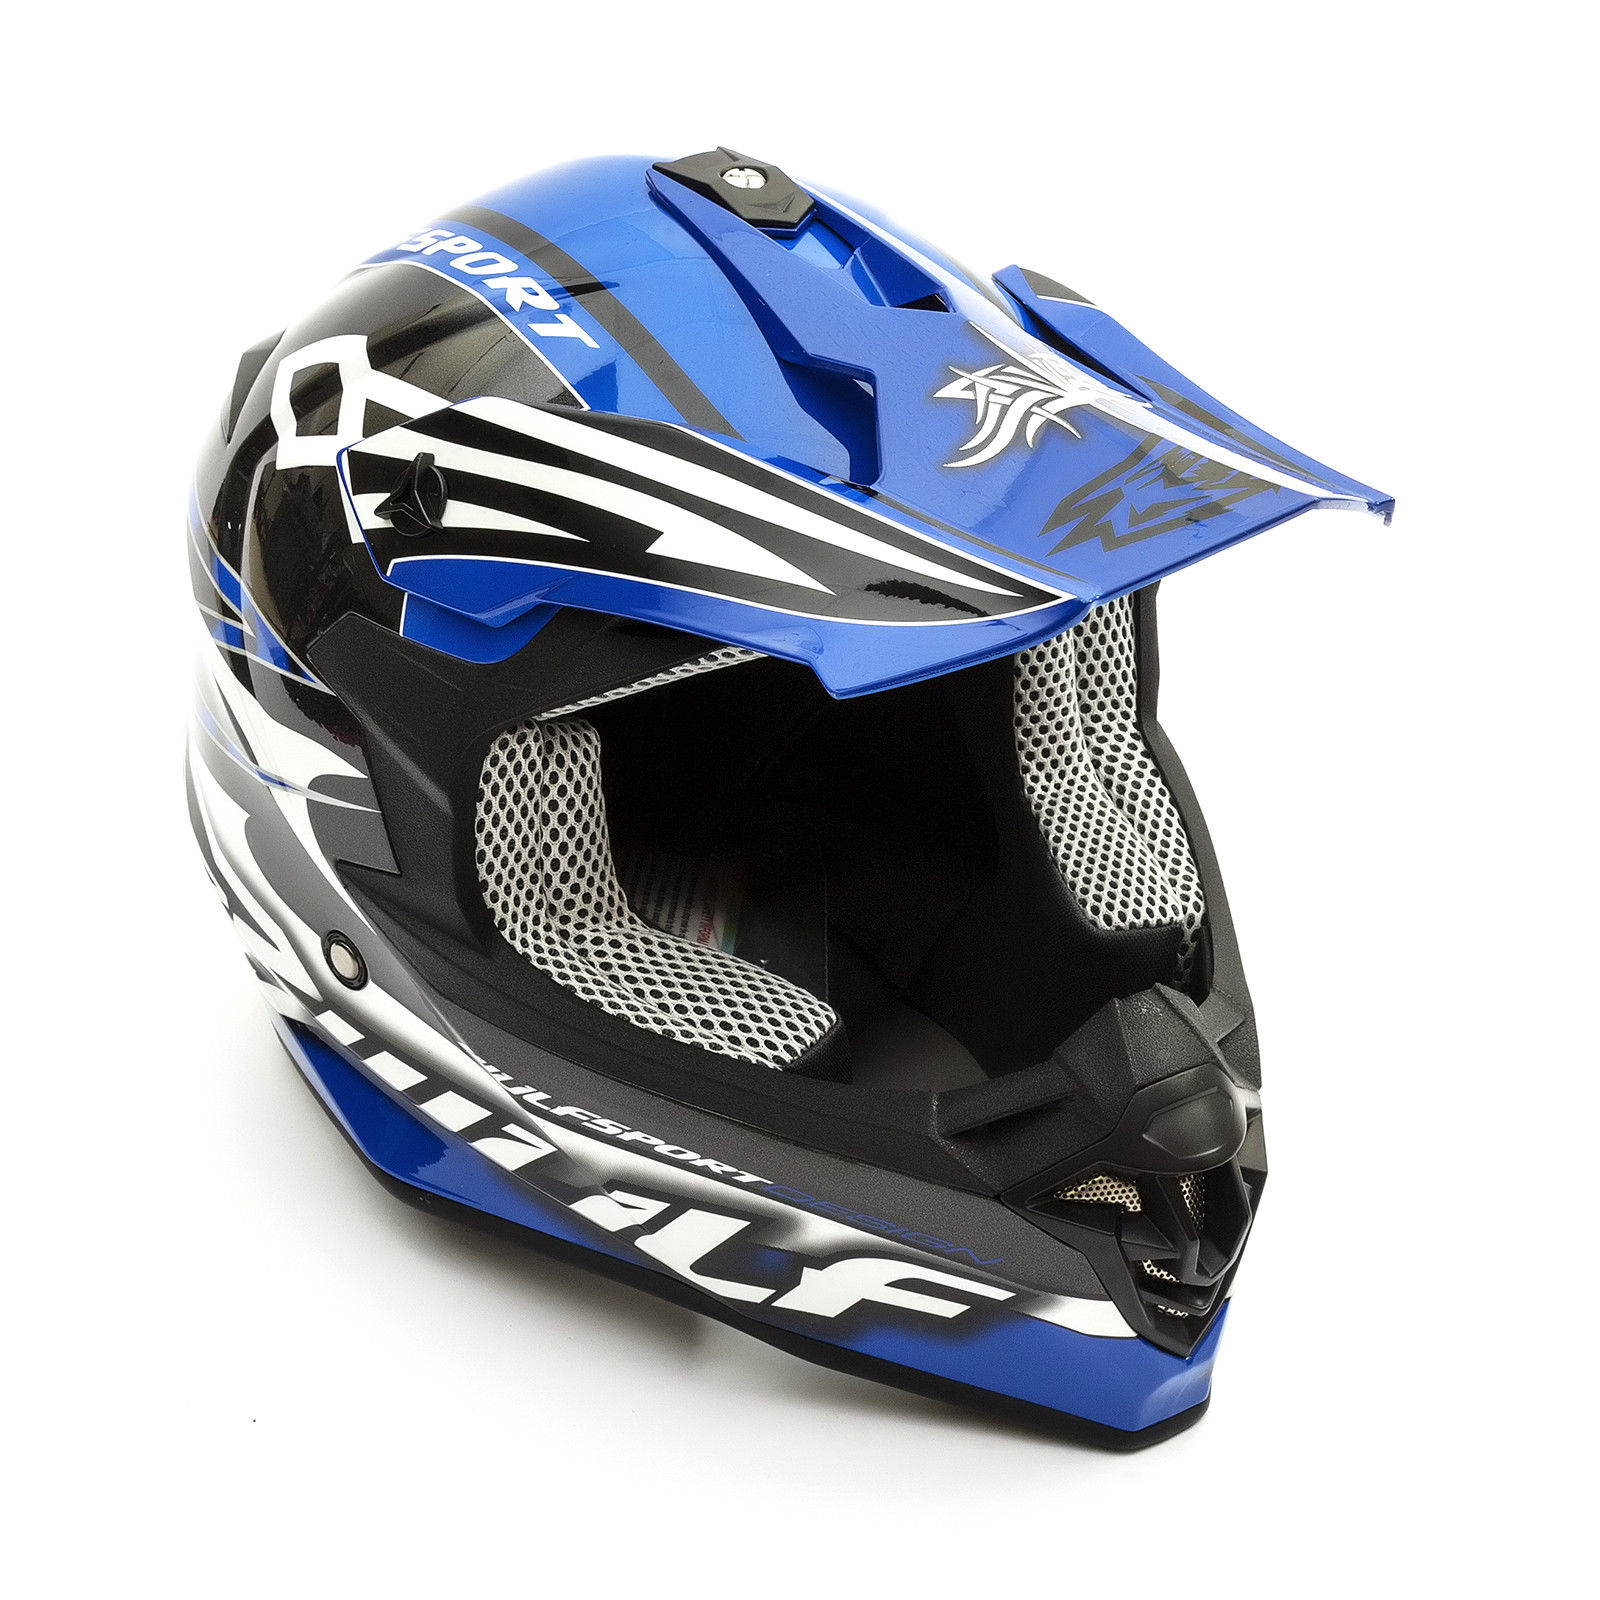 Wulfsport-Adult-Sceptre-Helmets-Motocross-Pitbike-Motorbike-Off-Road-Racing-ATV thumbnail 21